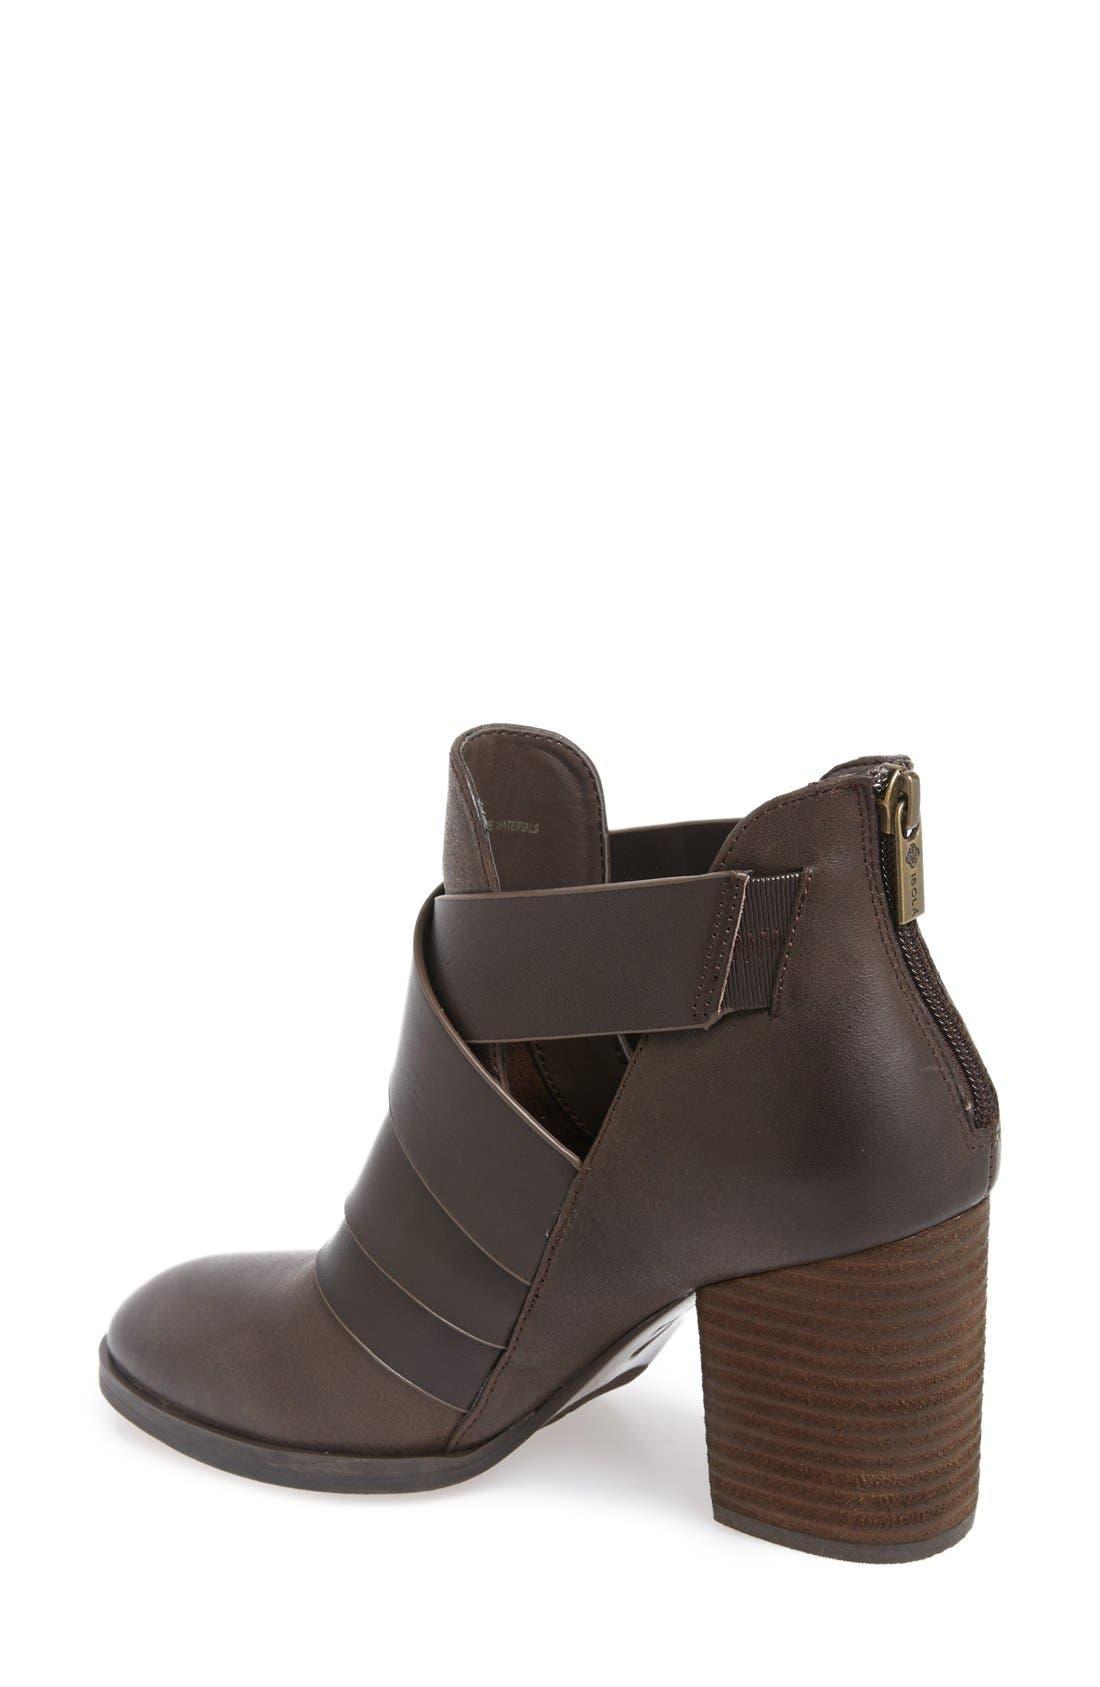 Isolà 'Ladora' Block Heel Bootie,                             Alternate thumbnail 2, color,                             Dark Brown Leather